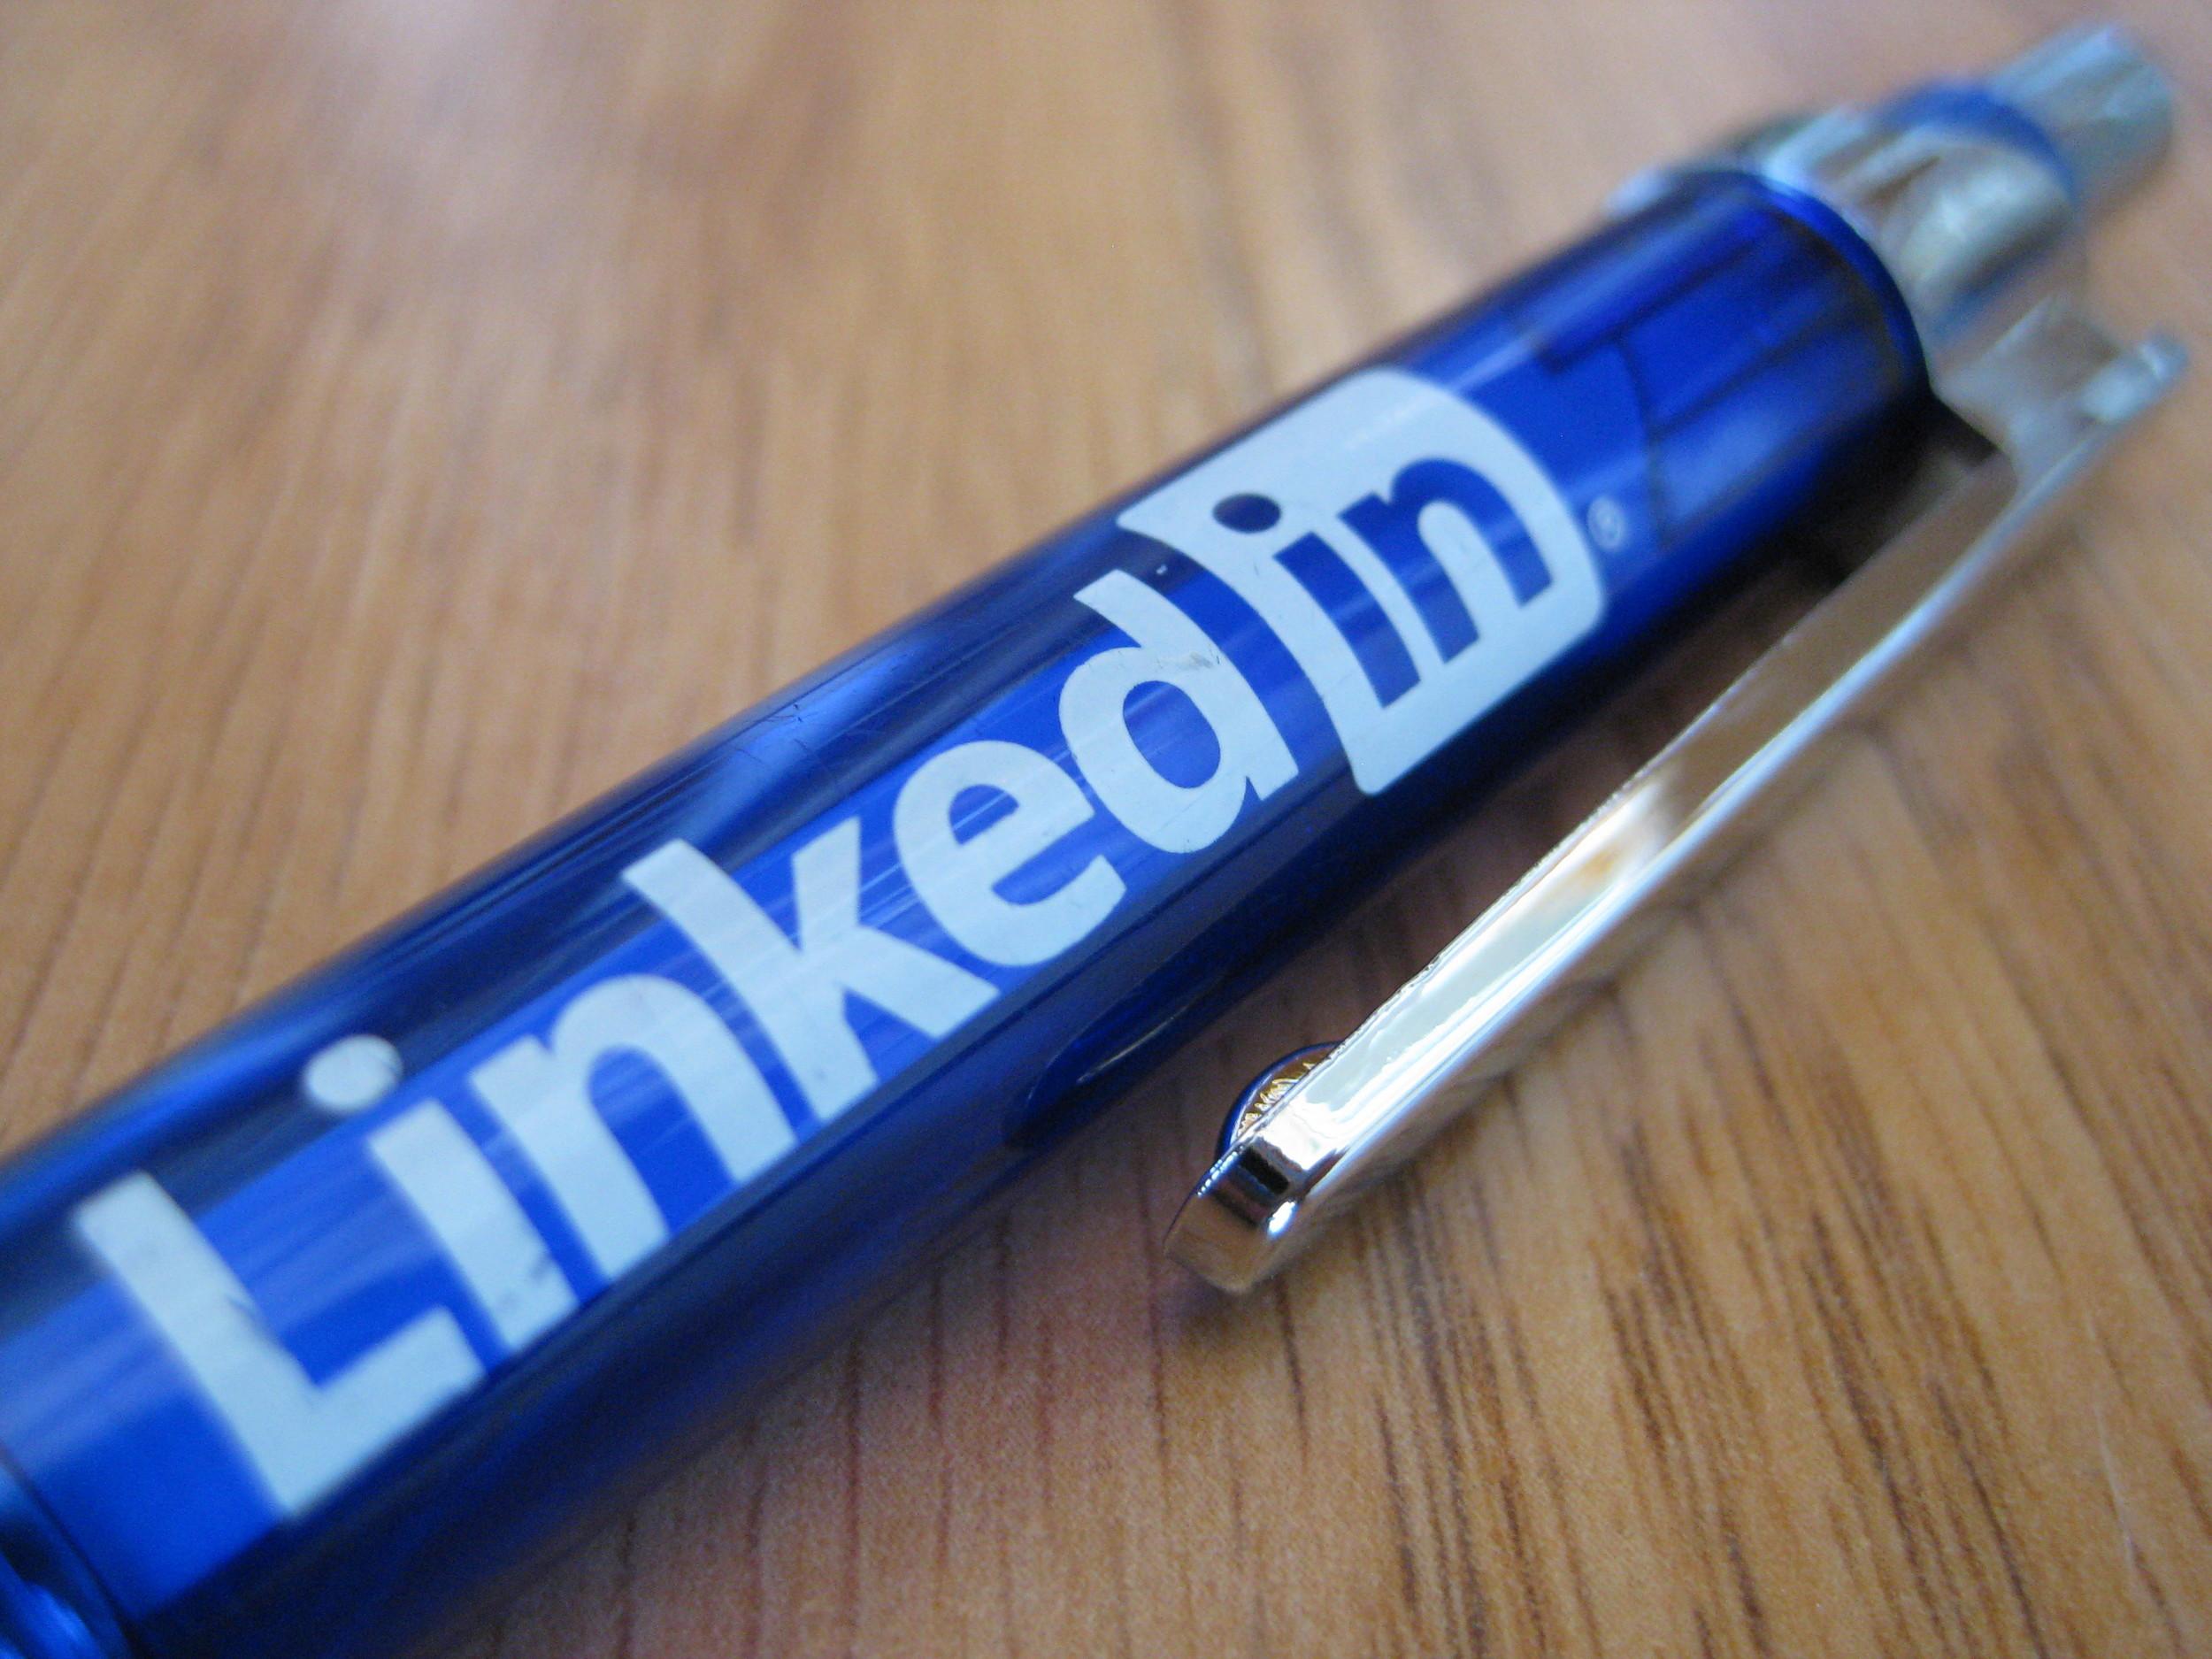 LinkedIn personal branding tips